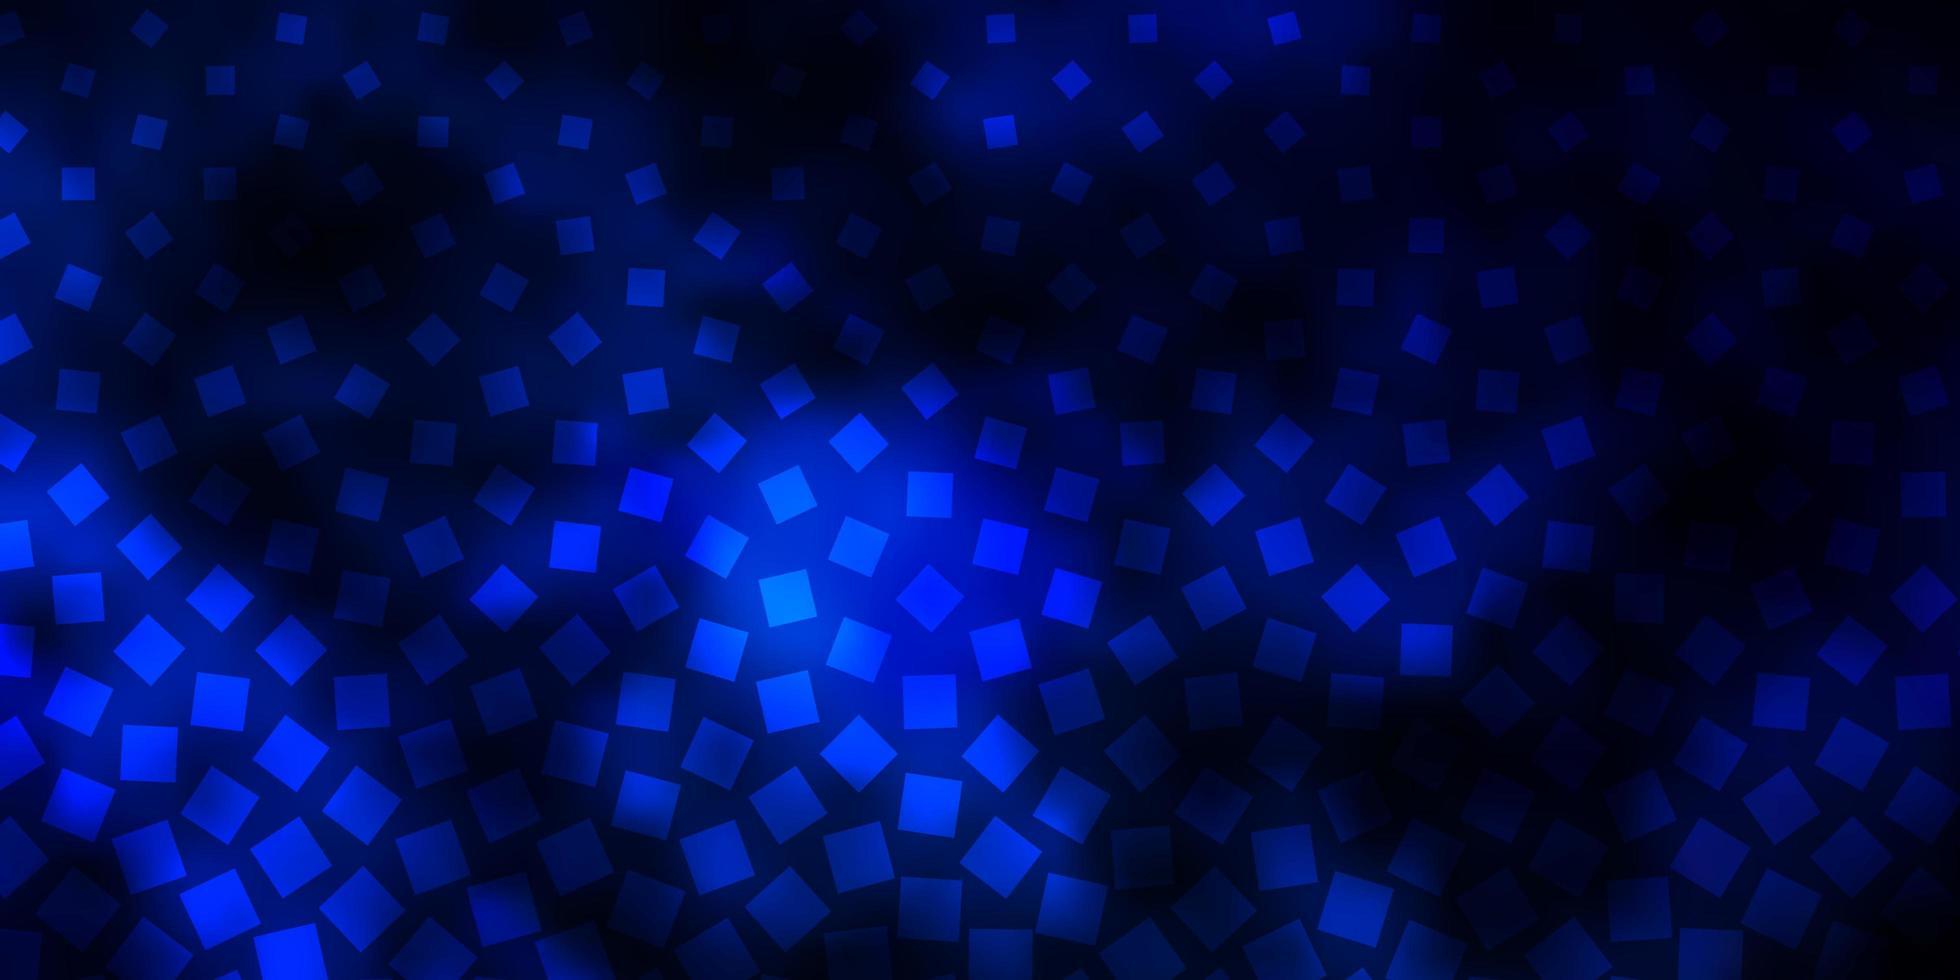 Dark BLUE vector backdrop with rectangles.